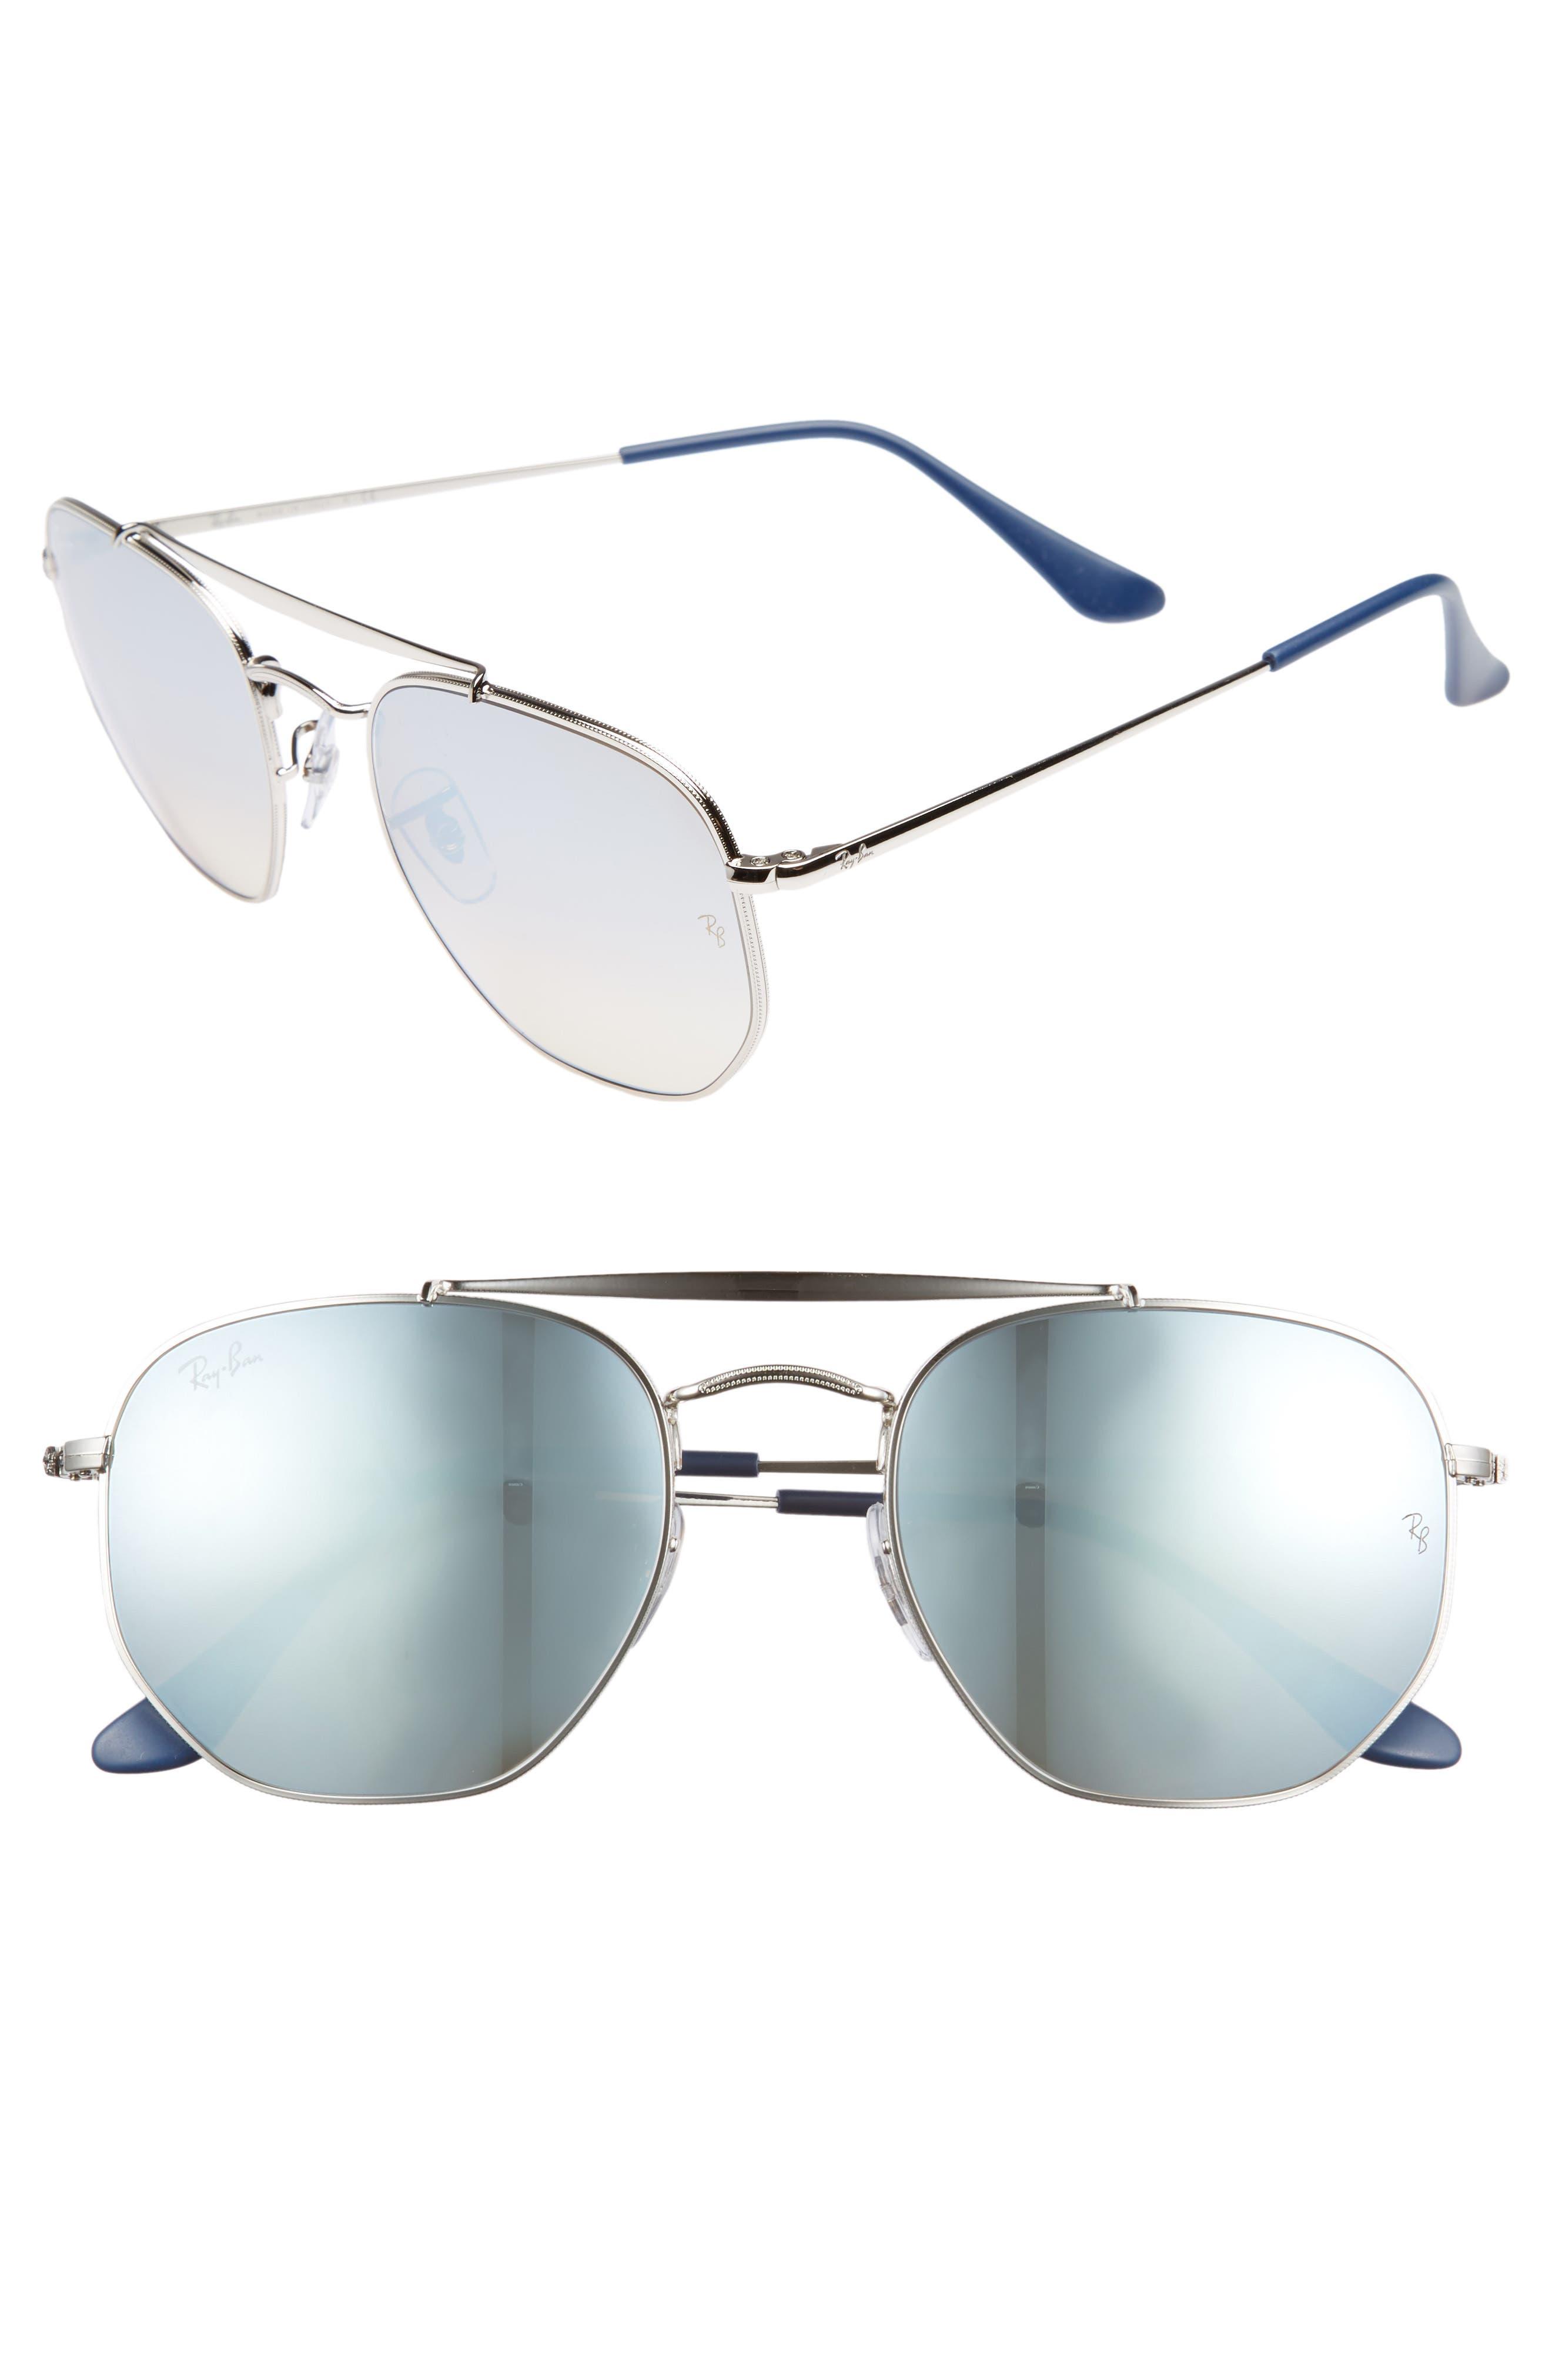 Marshal 54mm Aviator Sunglasses,                             Main thumbnail 1, color,                             Silver/ Mirror